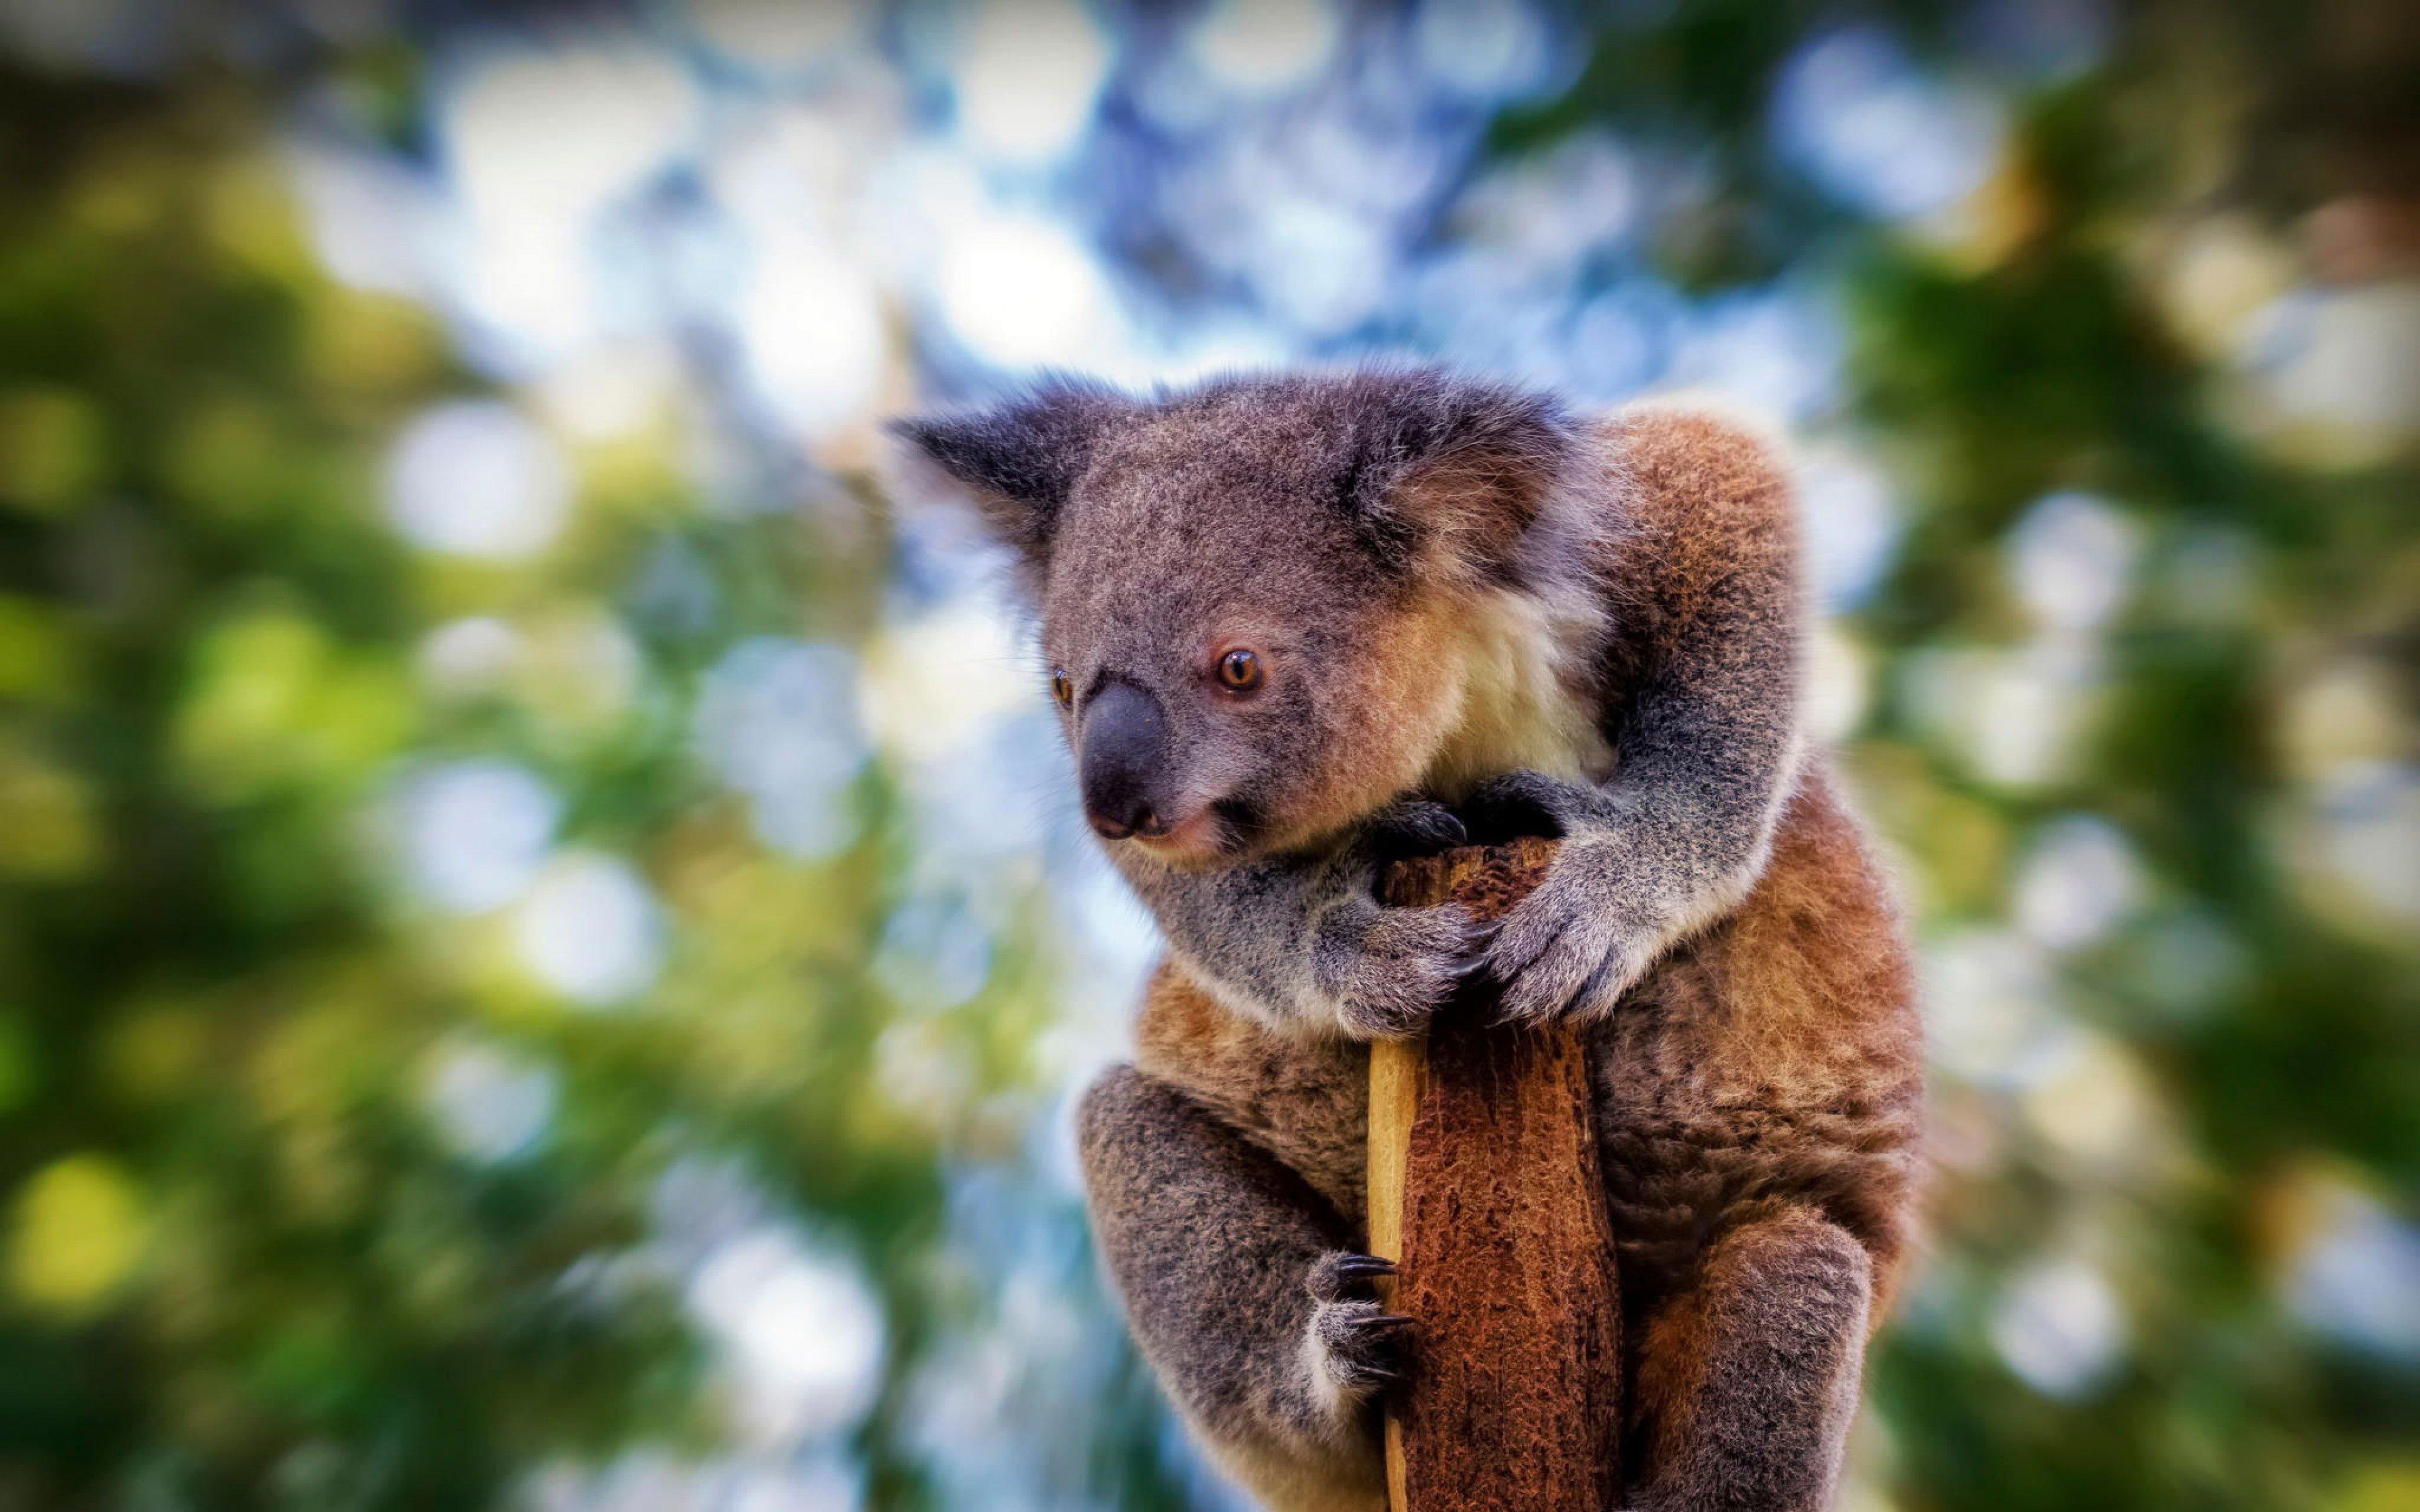 16 Wonderful HD Koala Wallpapers - HDWallSource.com